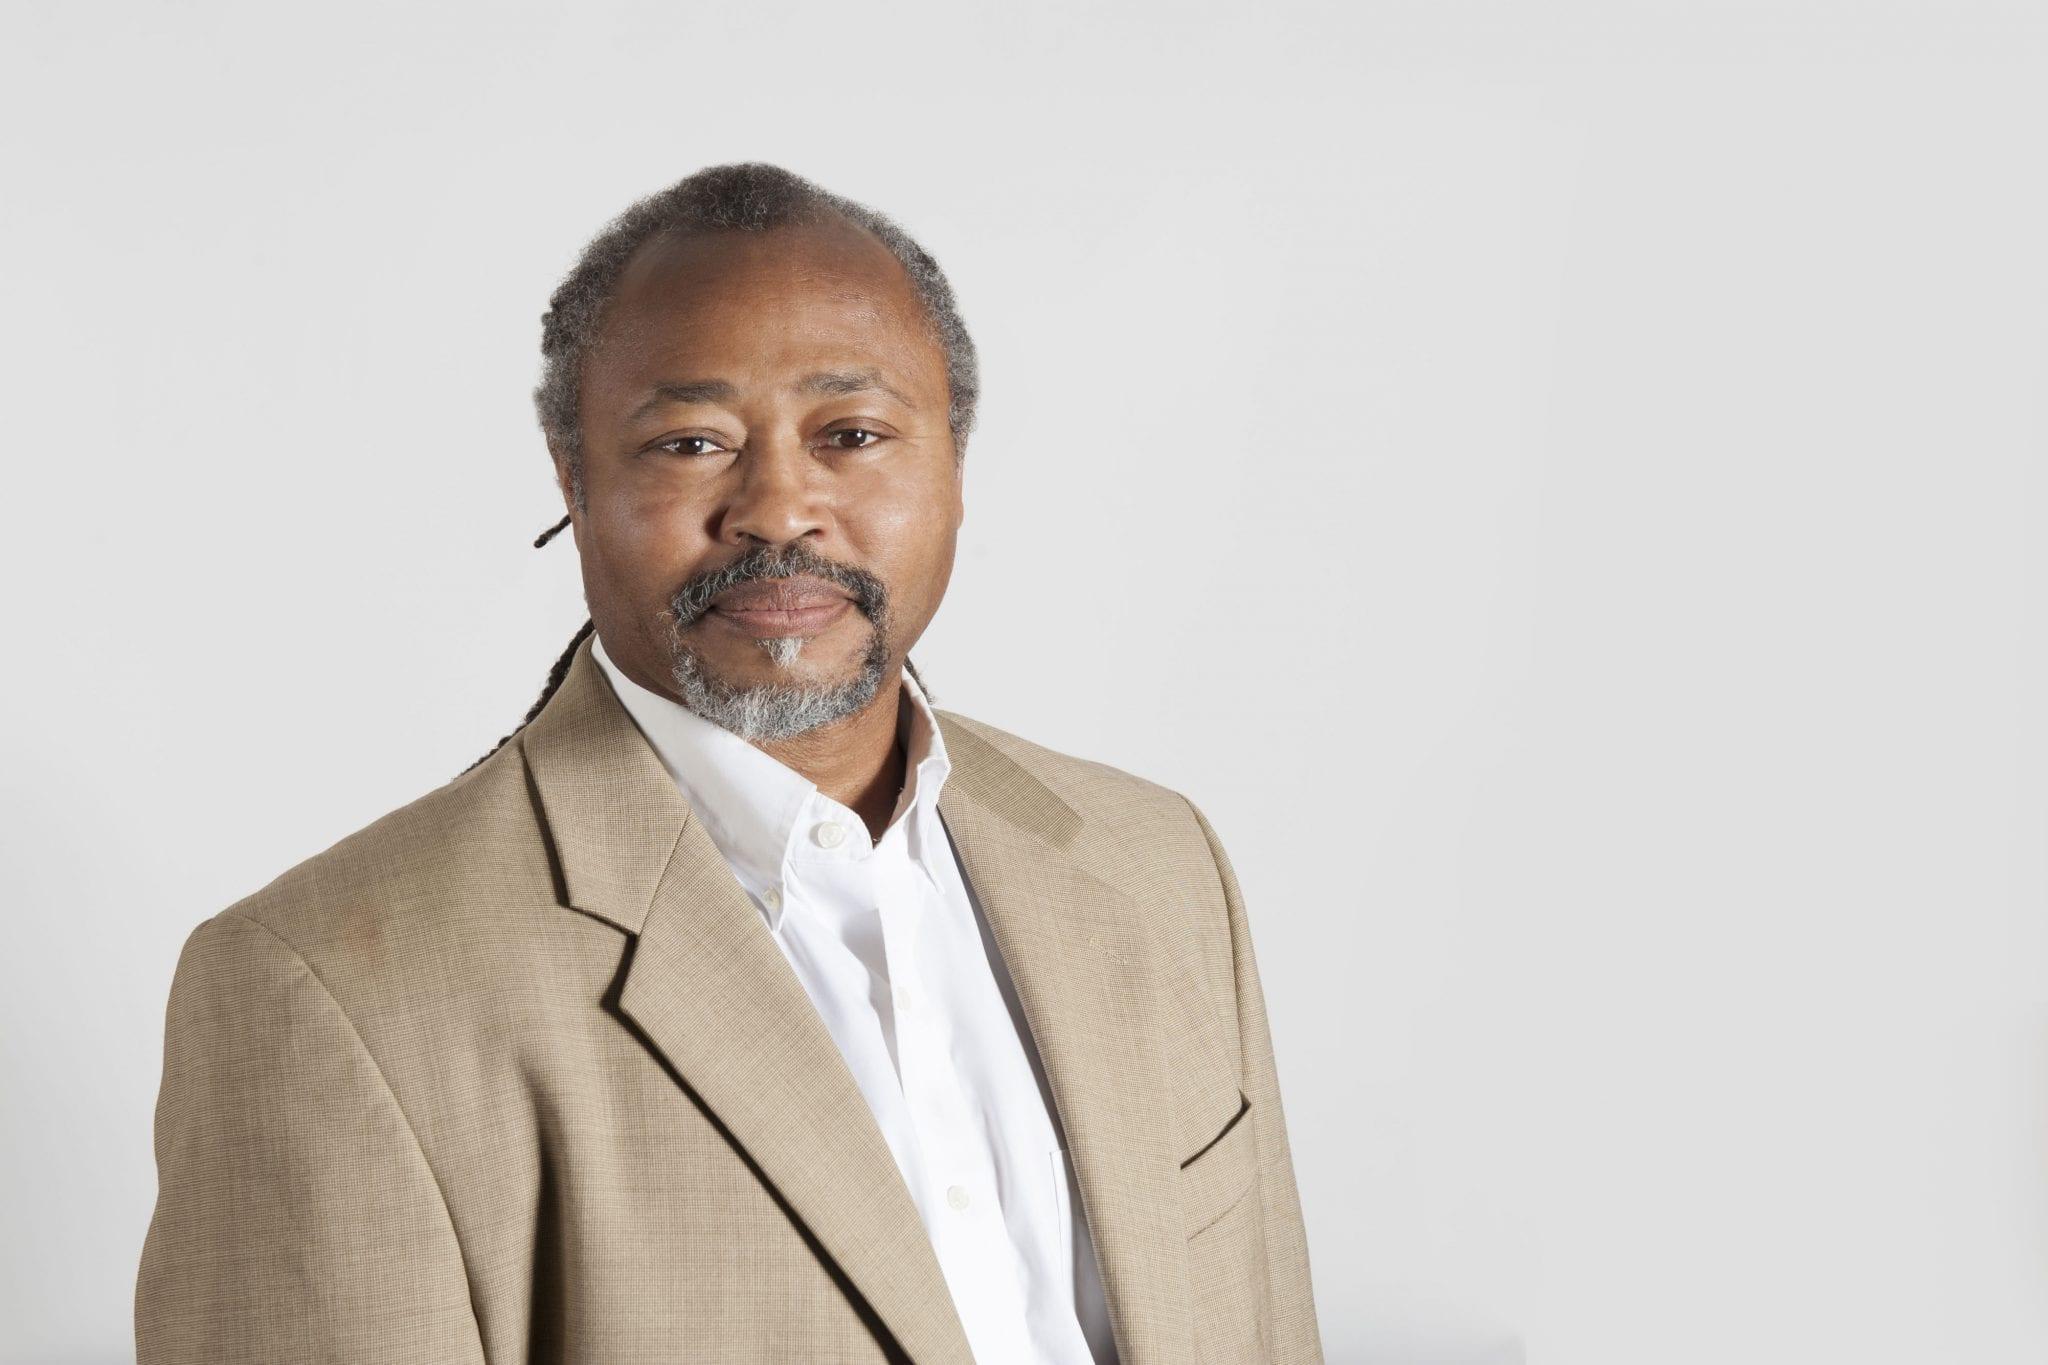 Portrait of Michael Bradford behind a gray backdrop